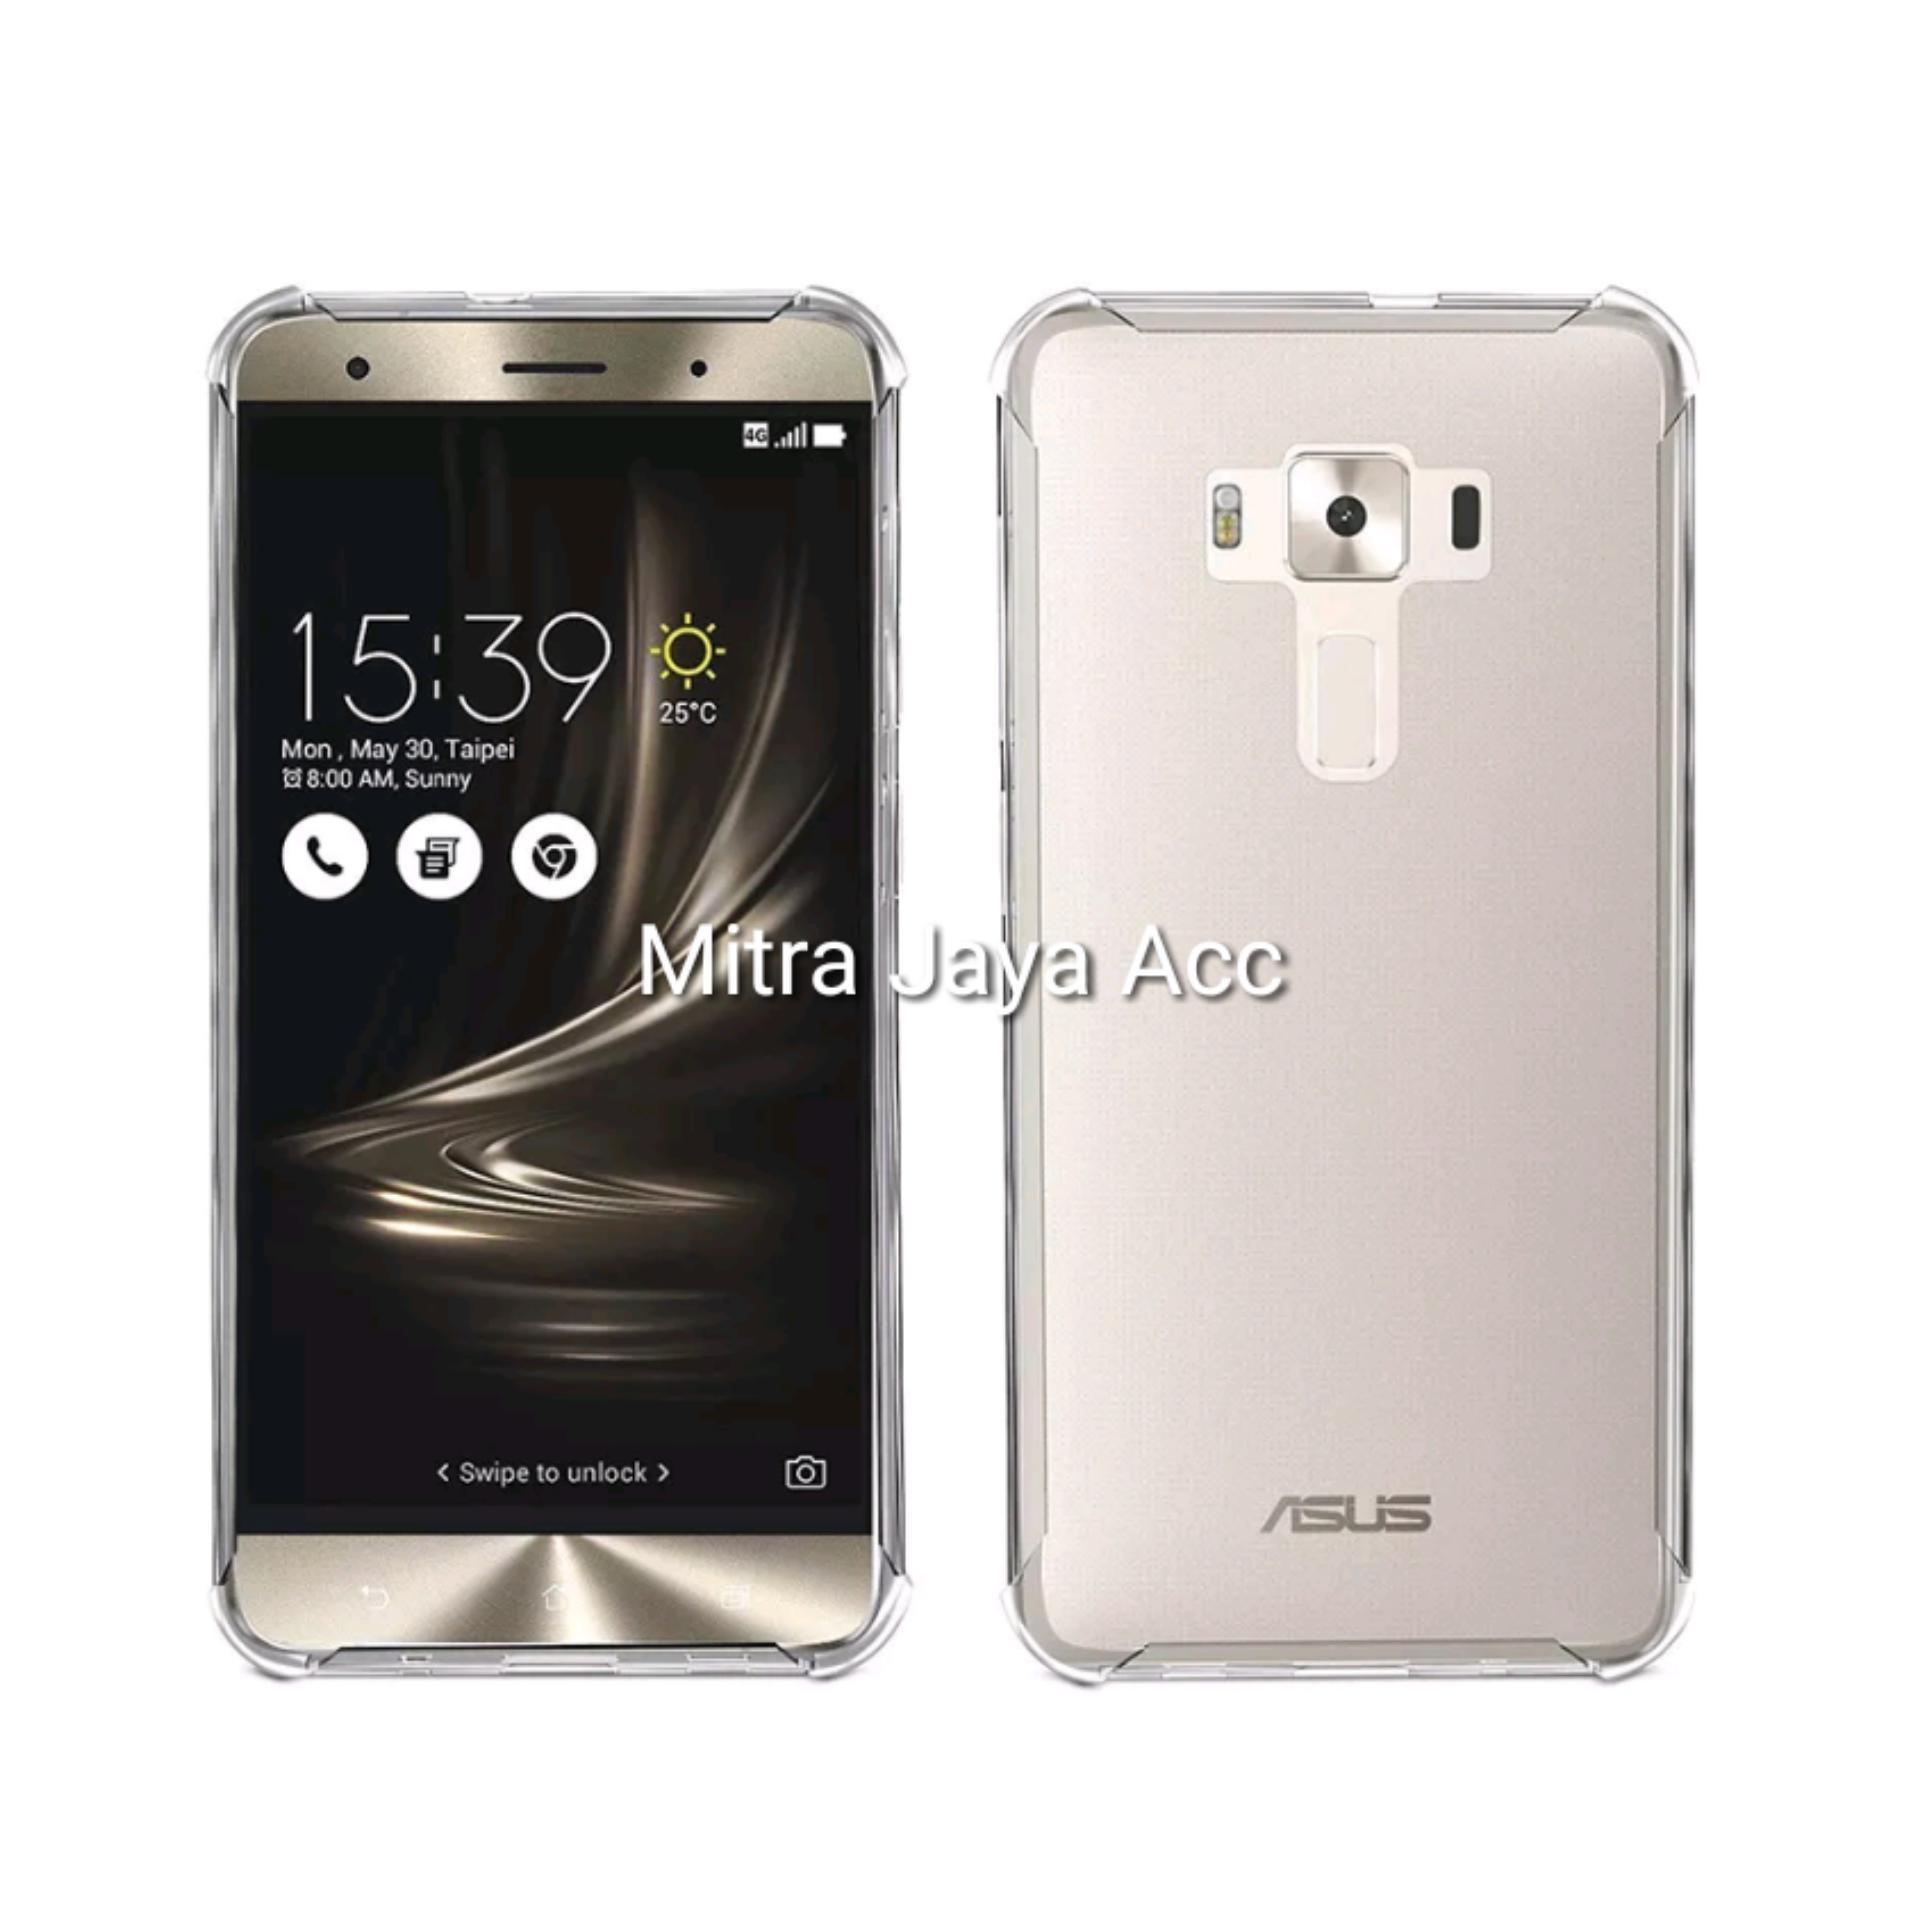 Zenfone 3 Max 5 Zc553kl Softcase Tpu Anti Crack Clear Daftar 2in1 Military Armor Hard Soft Case Asus 55 Detail Gambar Murah 55inch Silicone